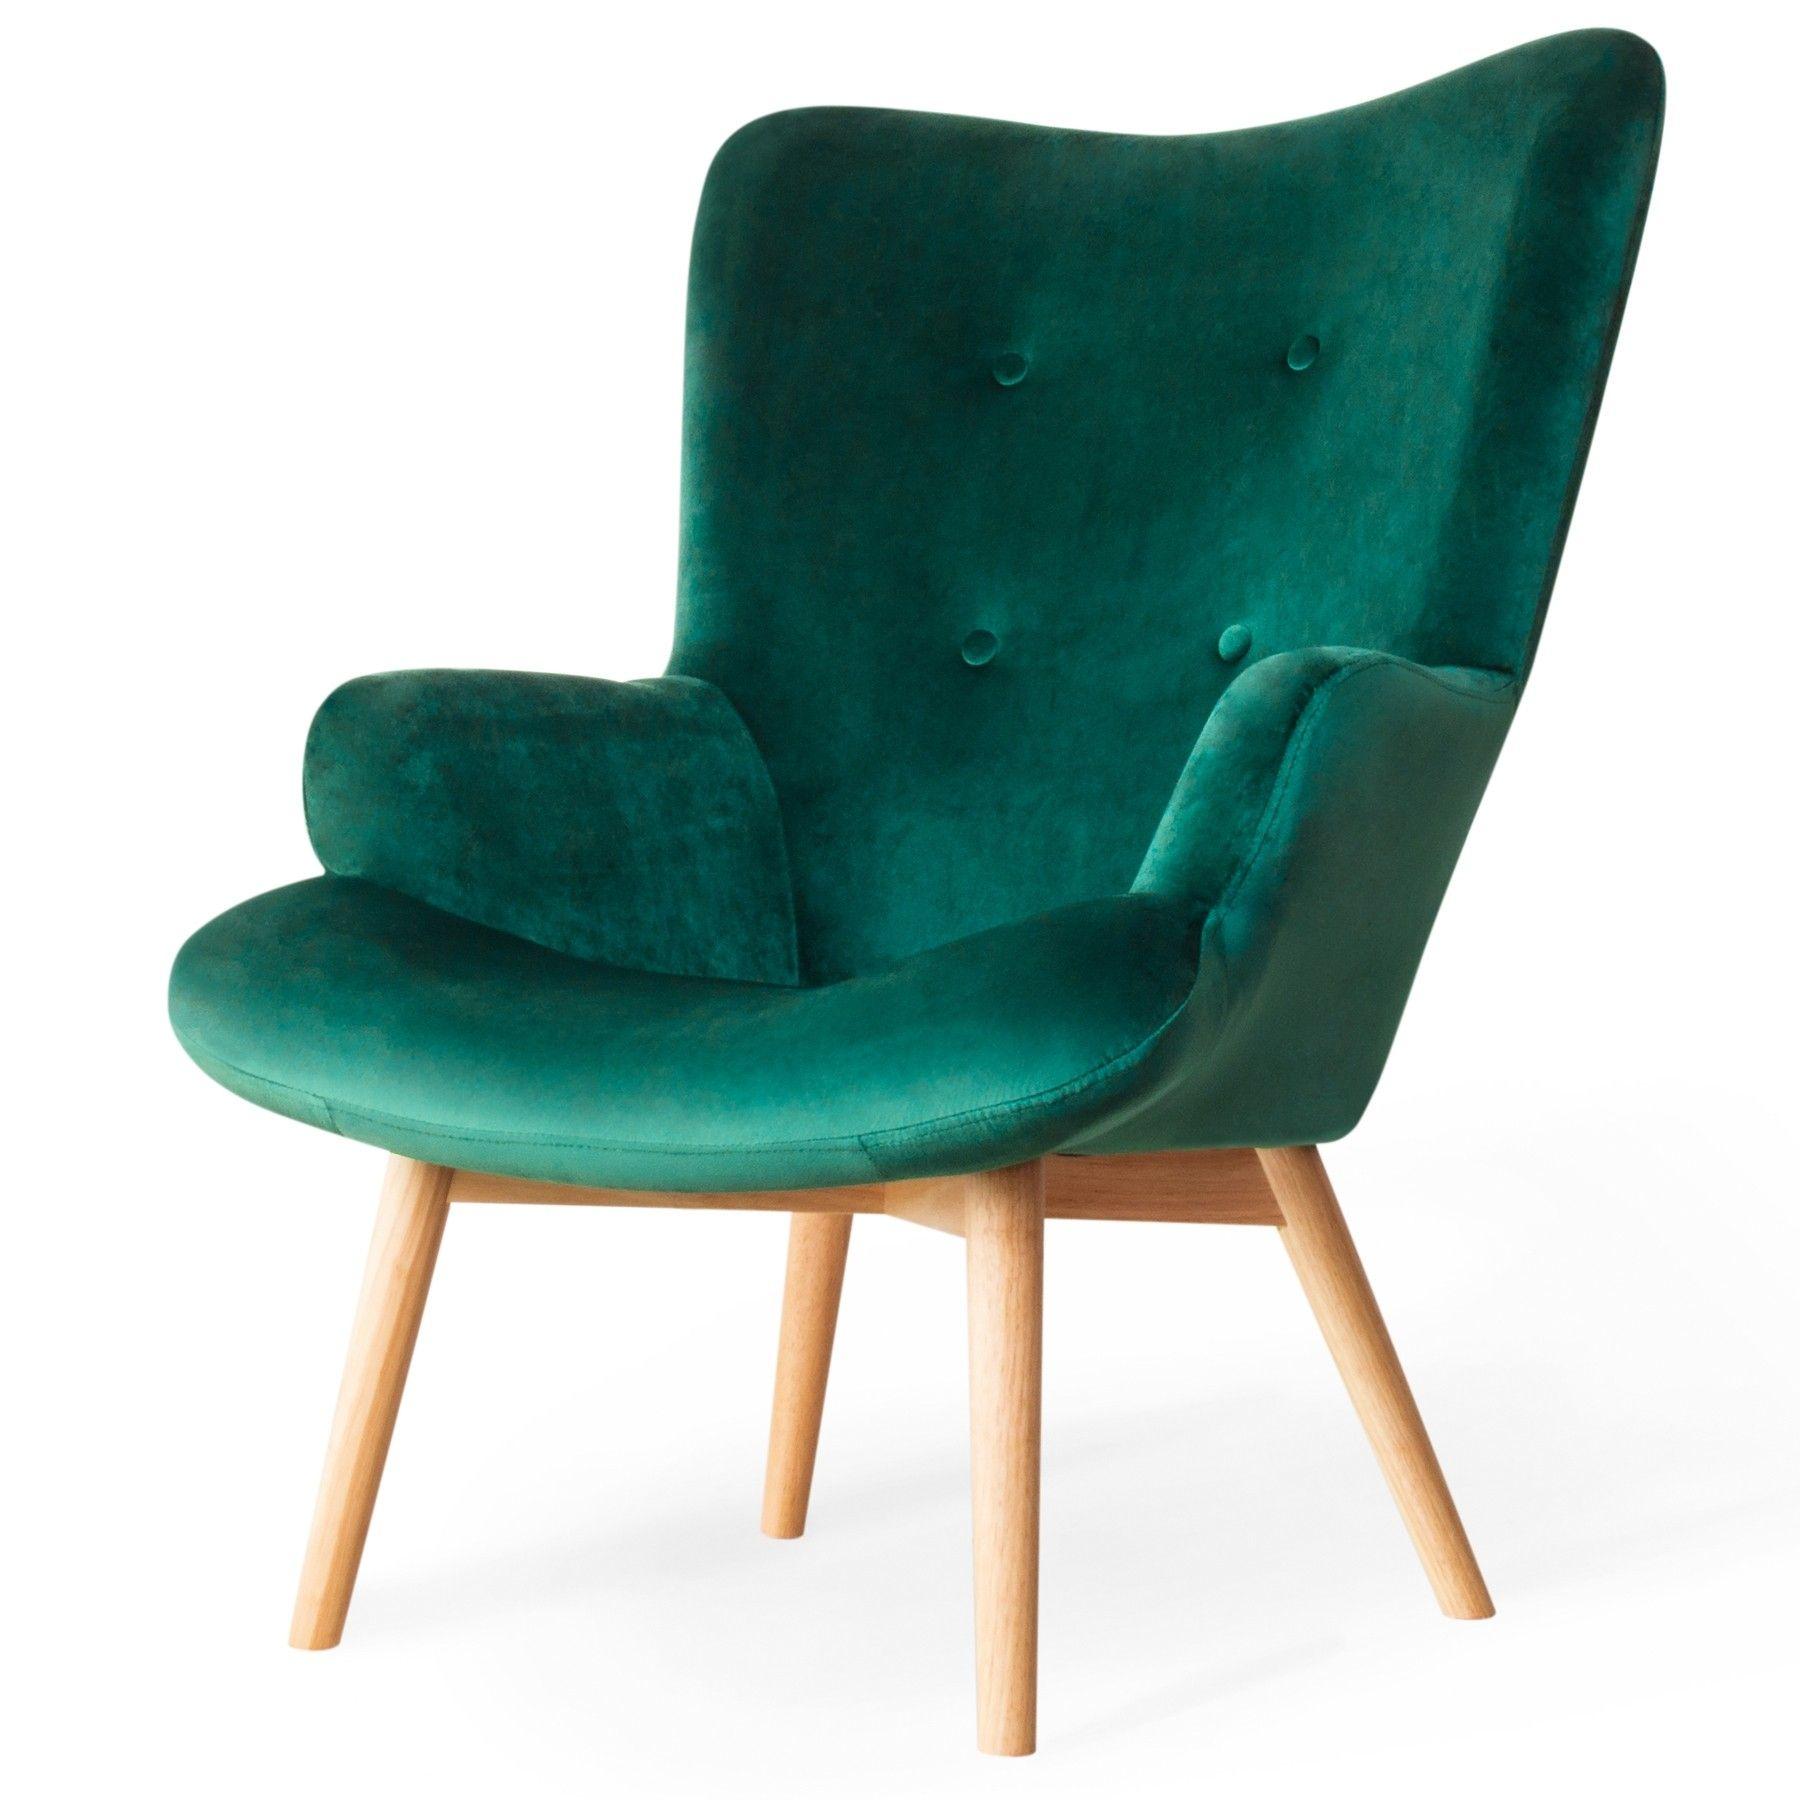 Moss Fotel Ciemnozielony 72x96 Cm Fotele I Pufy Meble